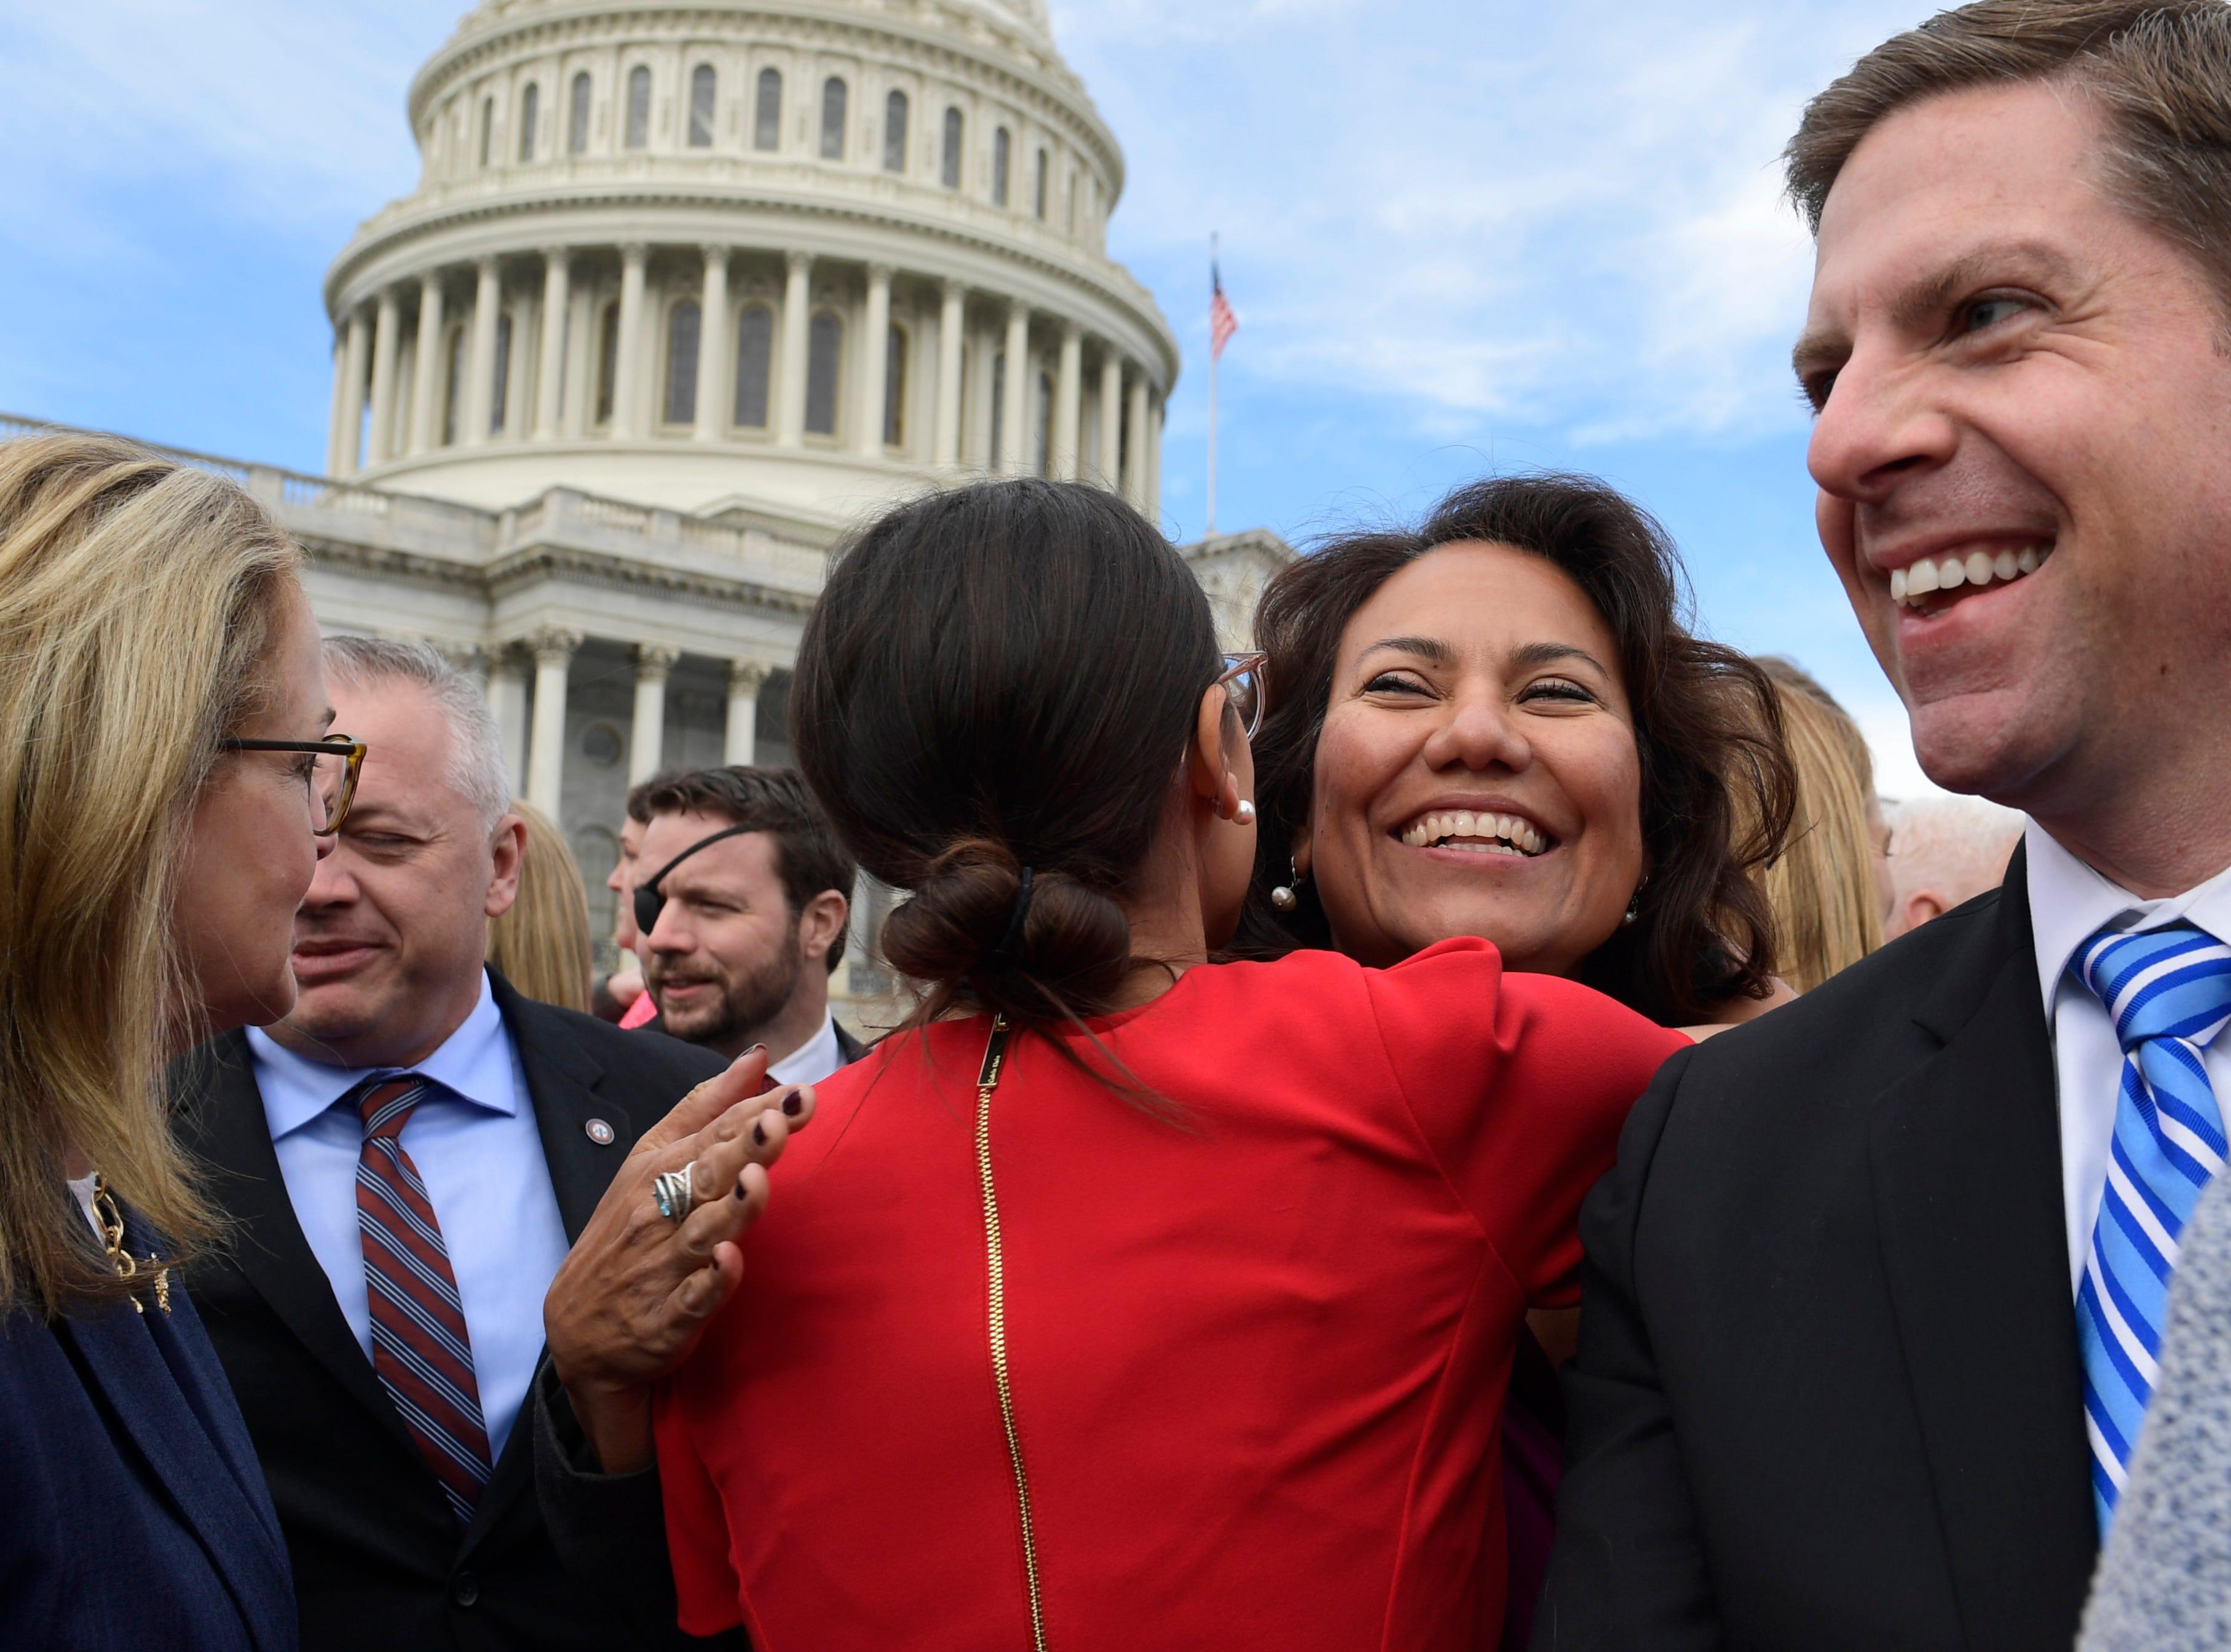 U.S. Rep.-elect Veronica Escobar, D-El Paso, arrives in Washington, D.C.